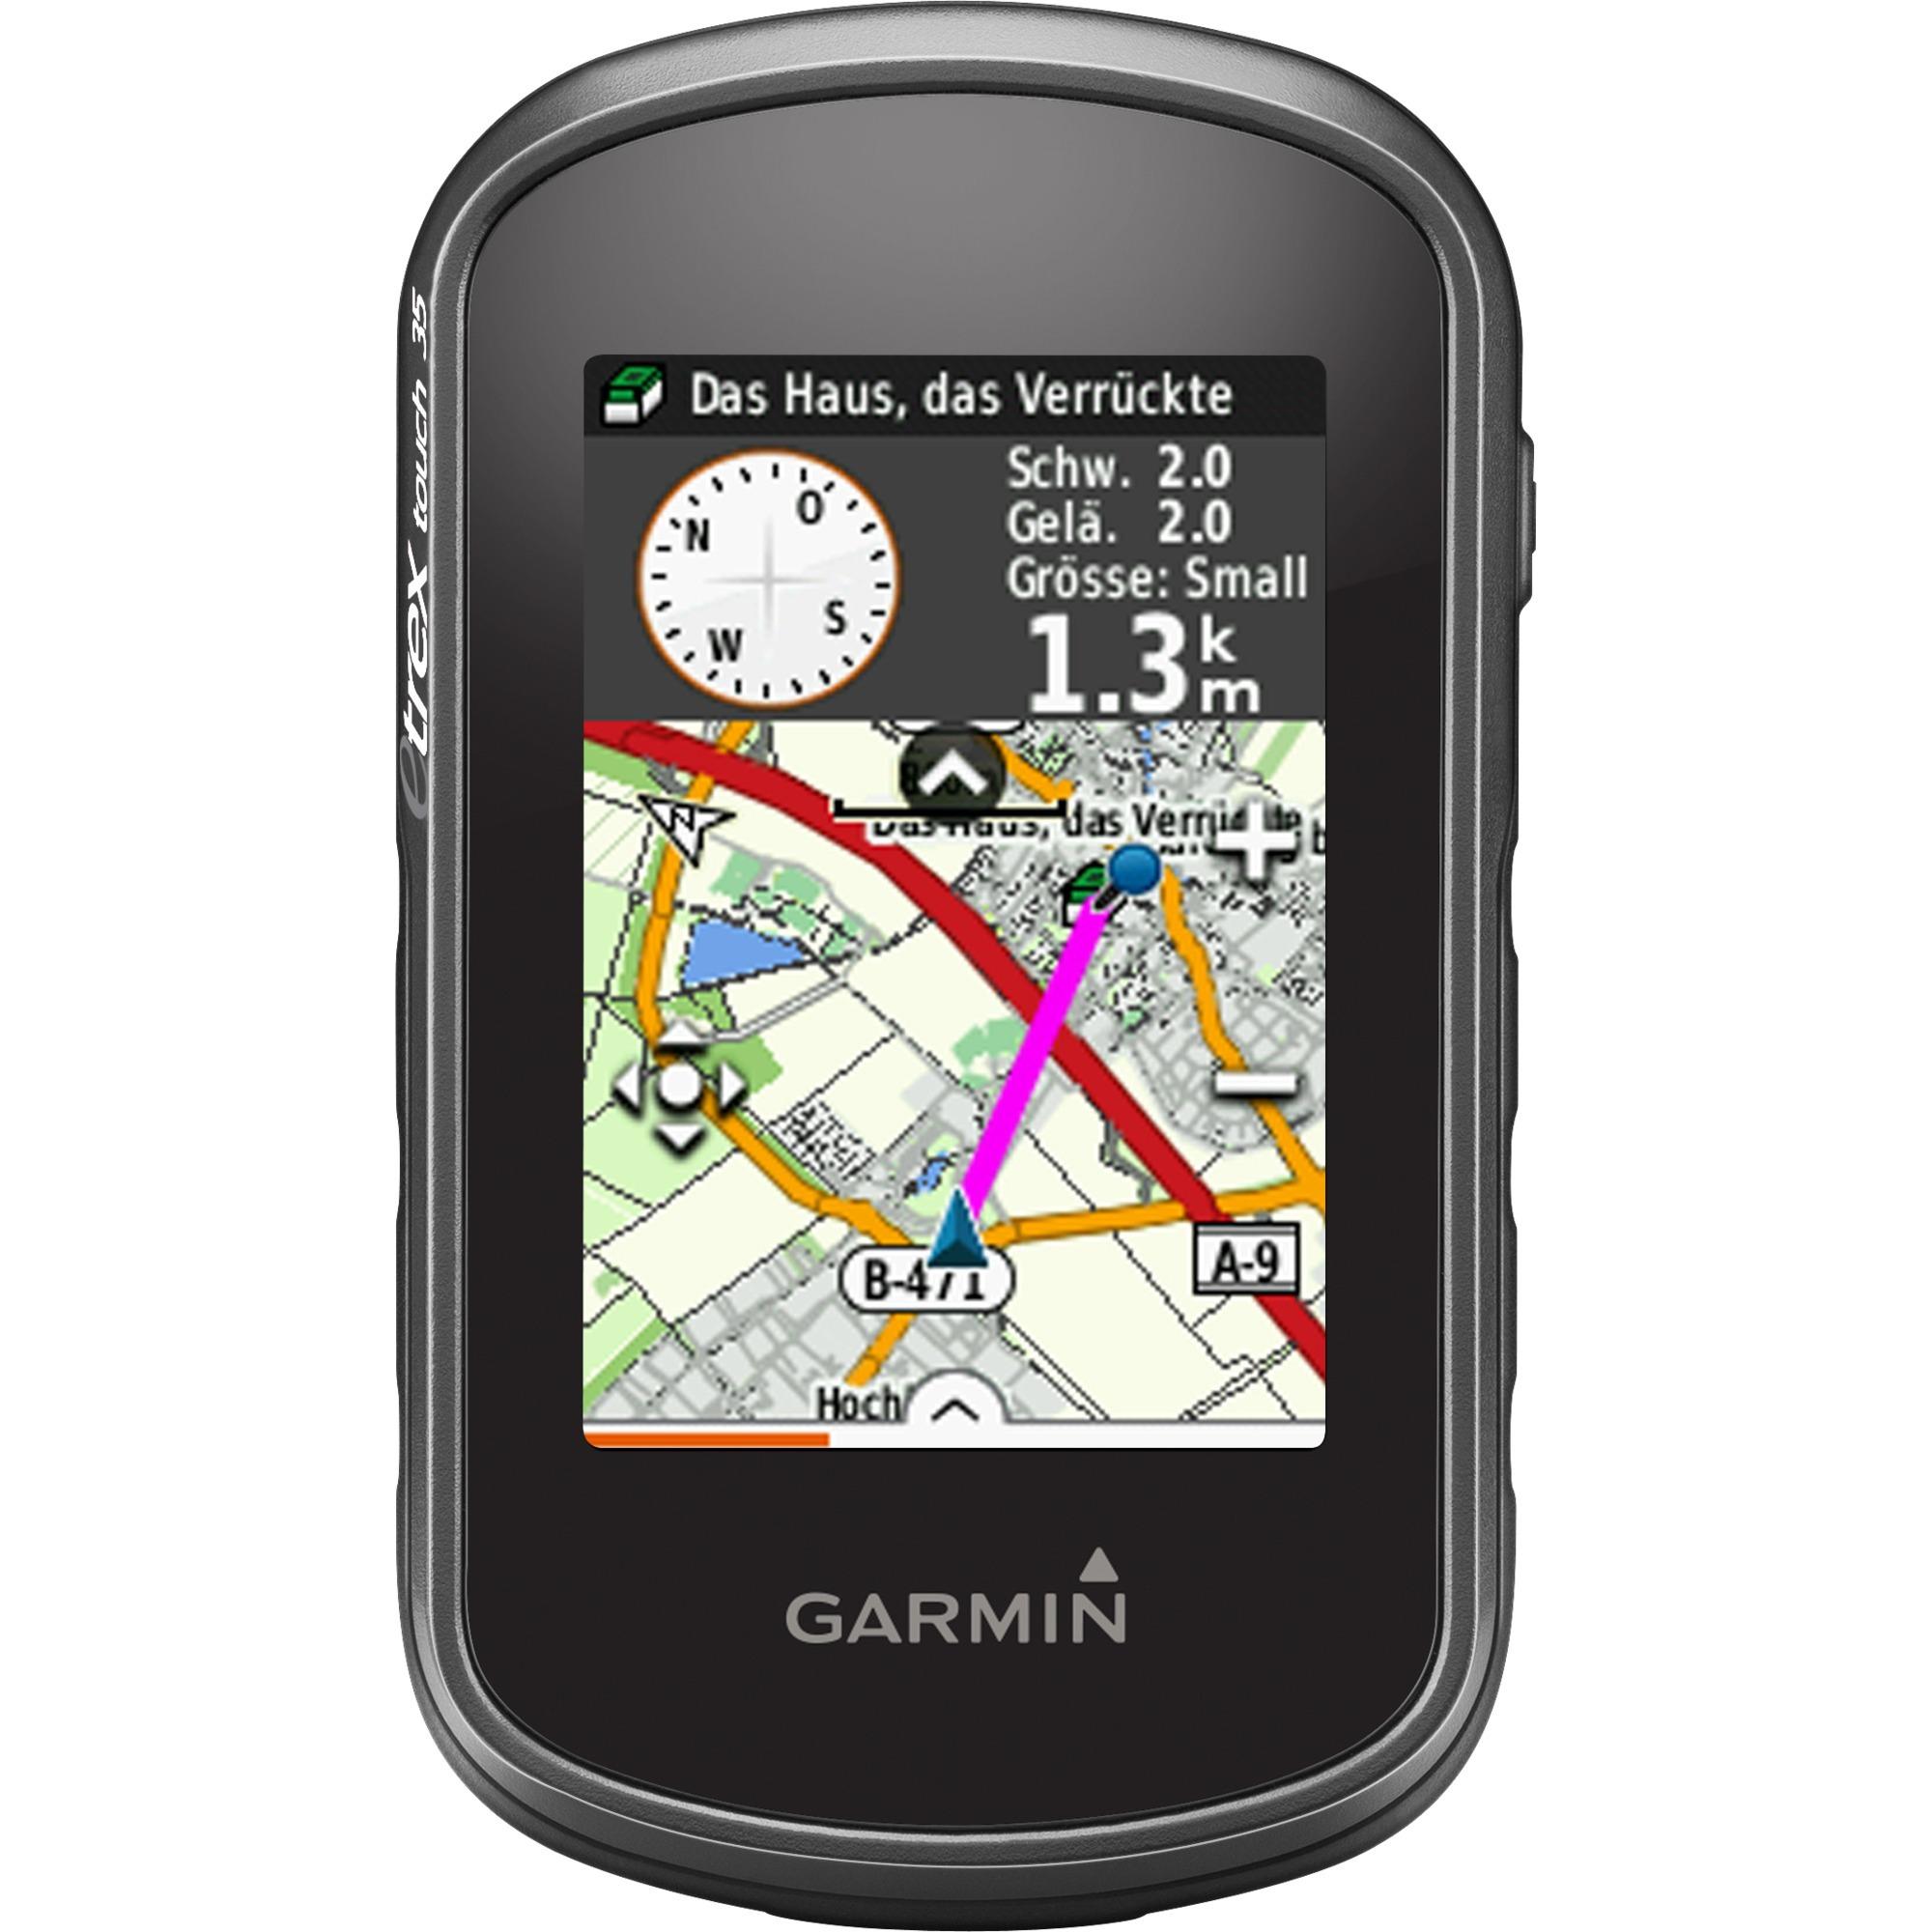 etrex-touch-35-haandholdt-26-tft-beroringsfolsom-skarm-159g-sort-navigator-navigationssystemet